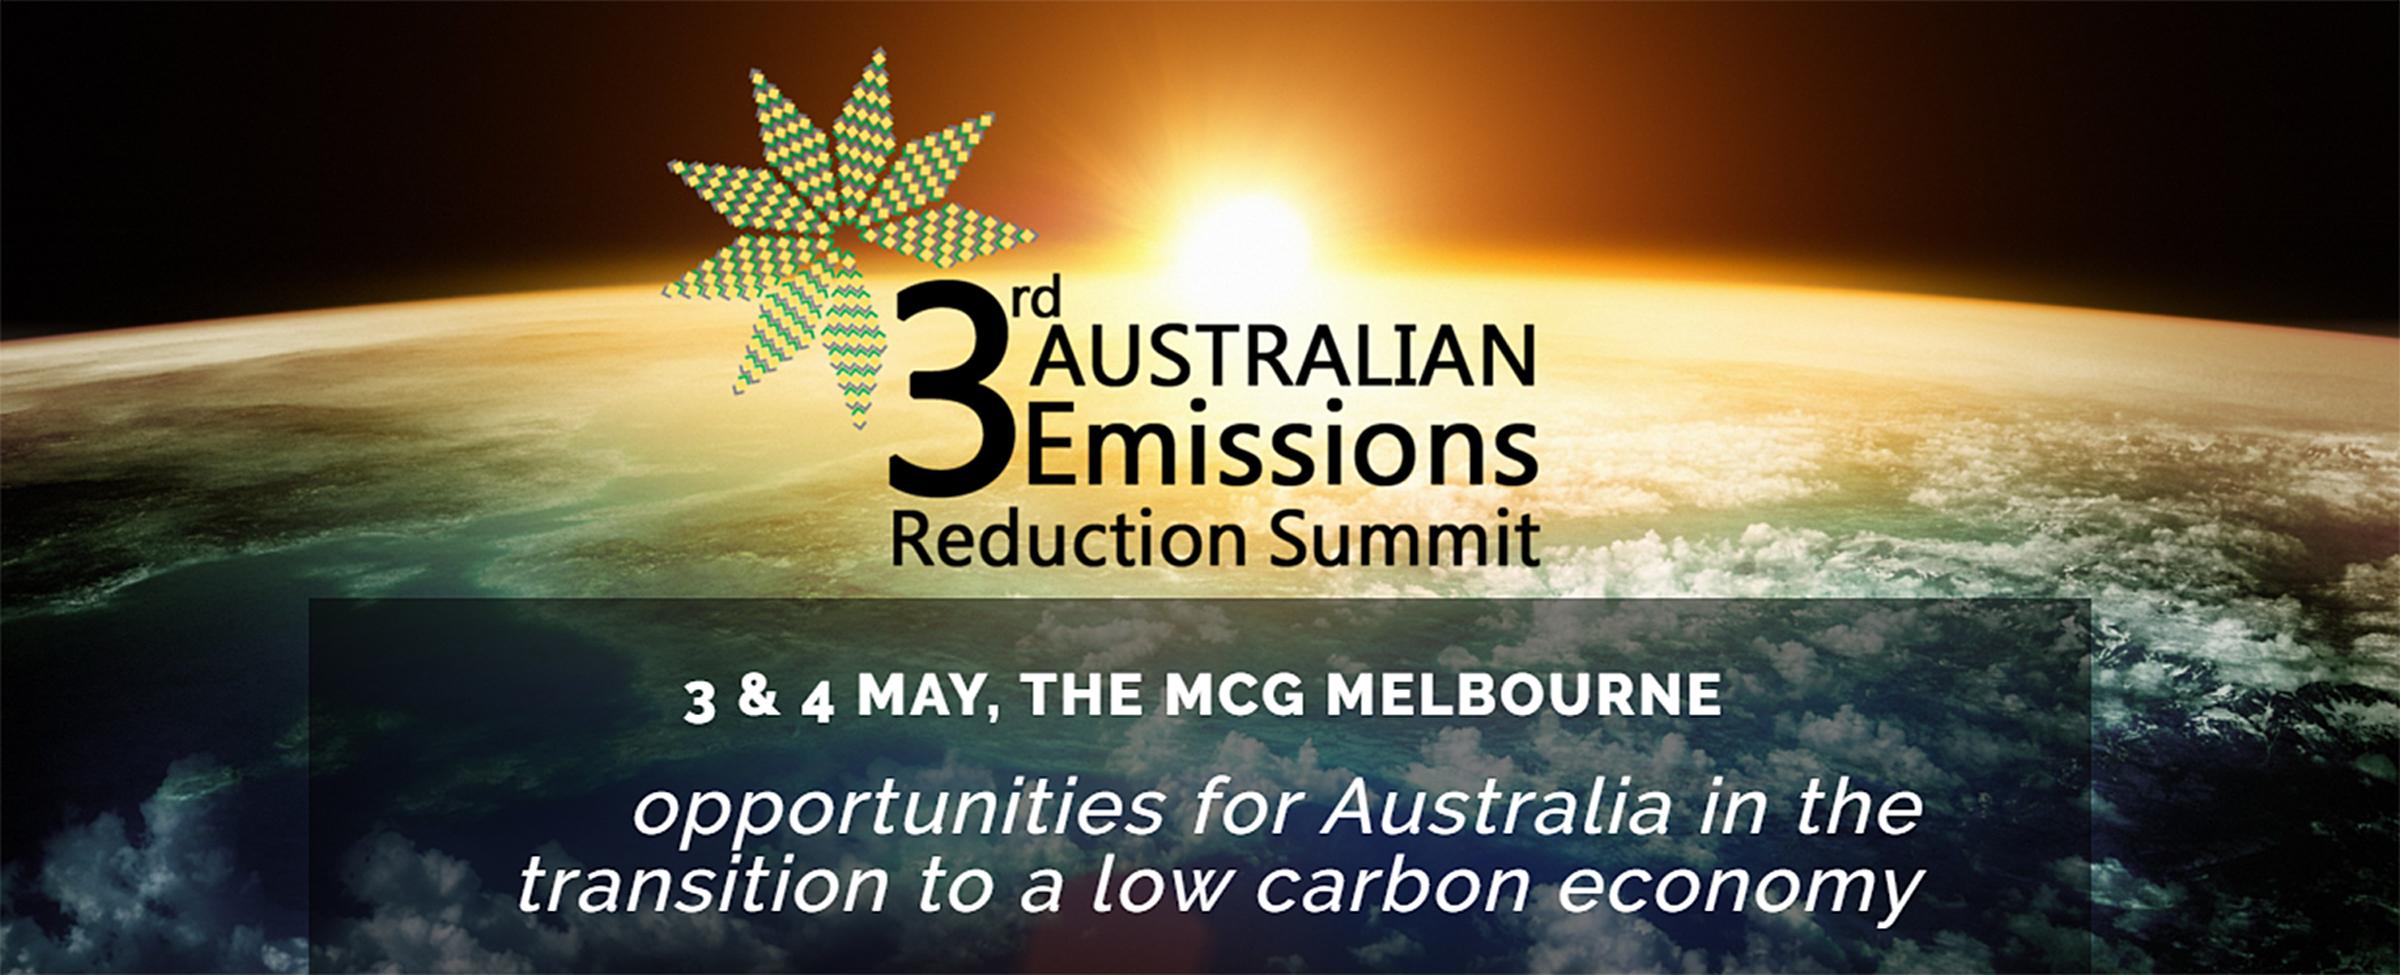 3rd Australian Emissions Reduction Summit.png